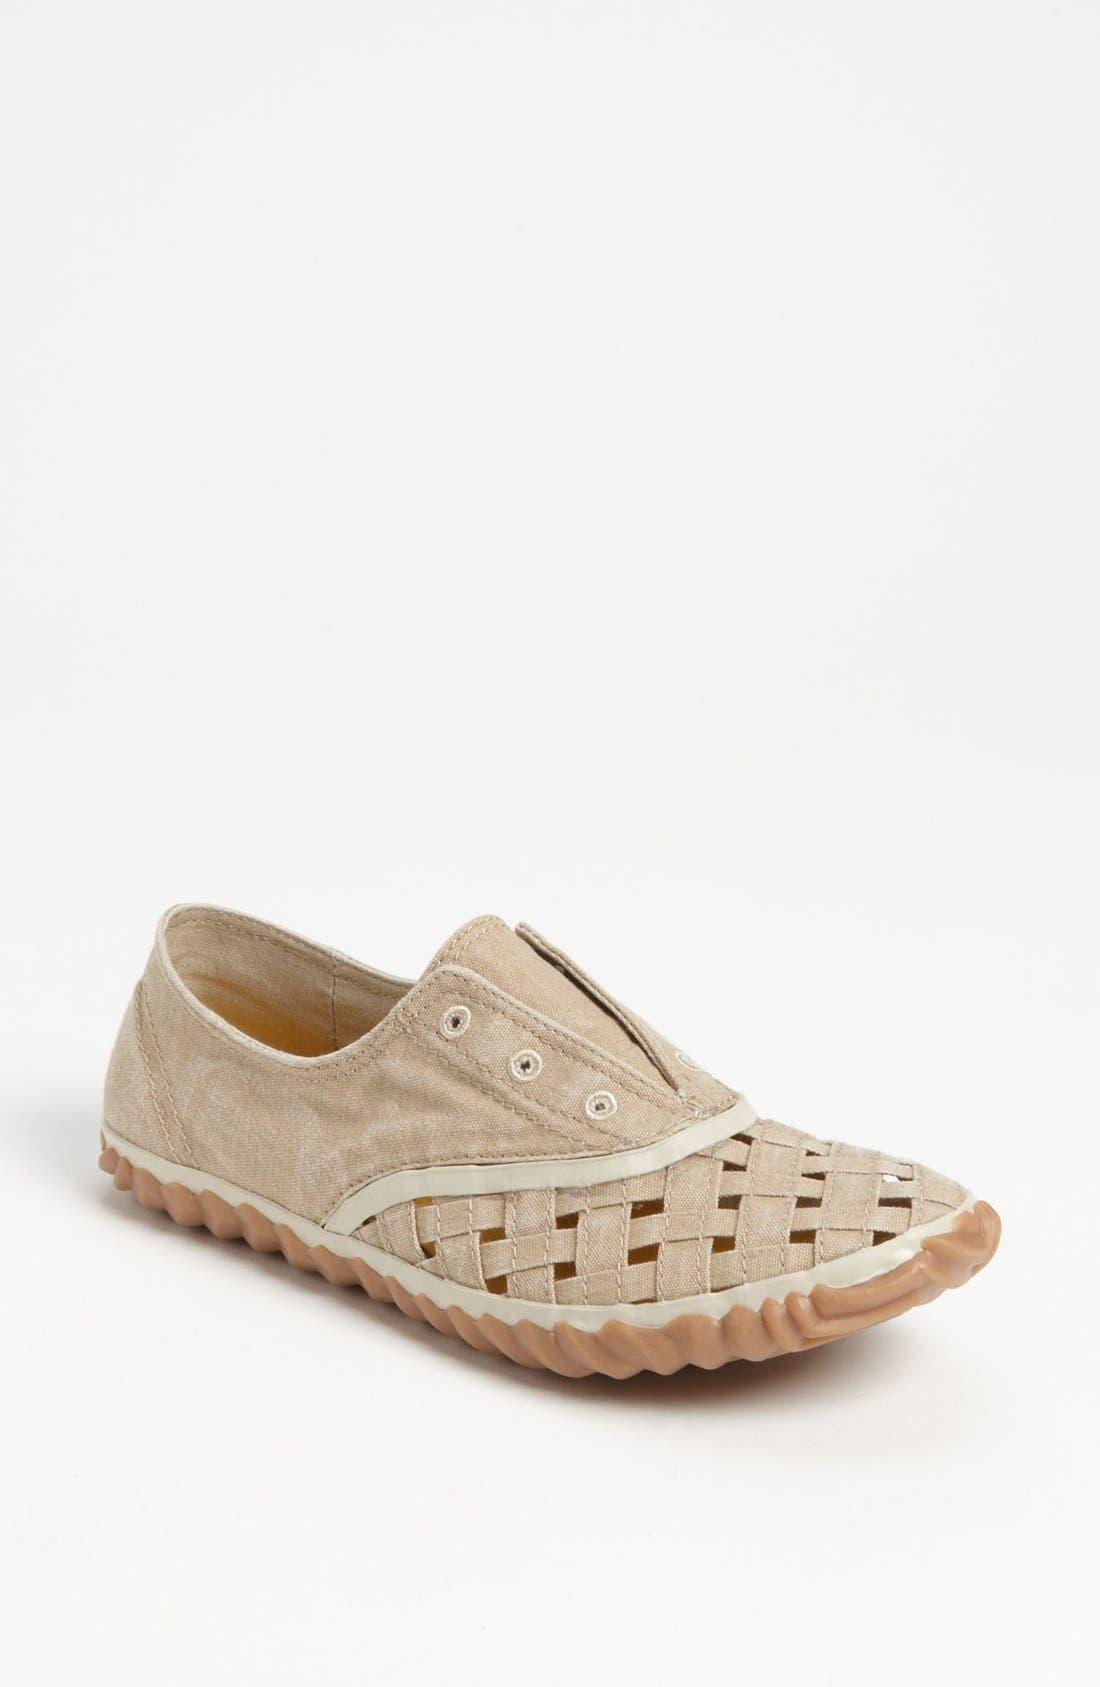 Main Image - Sorel 'Picnic Weave Plimsole™' Sneaker